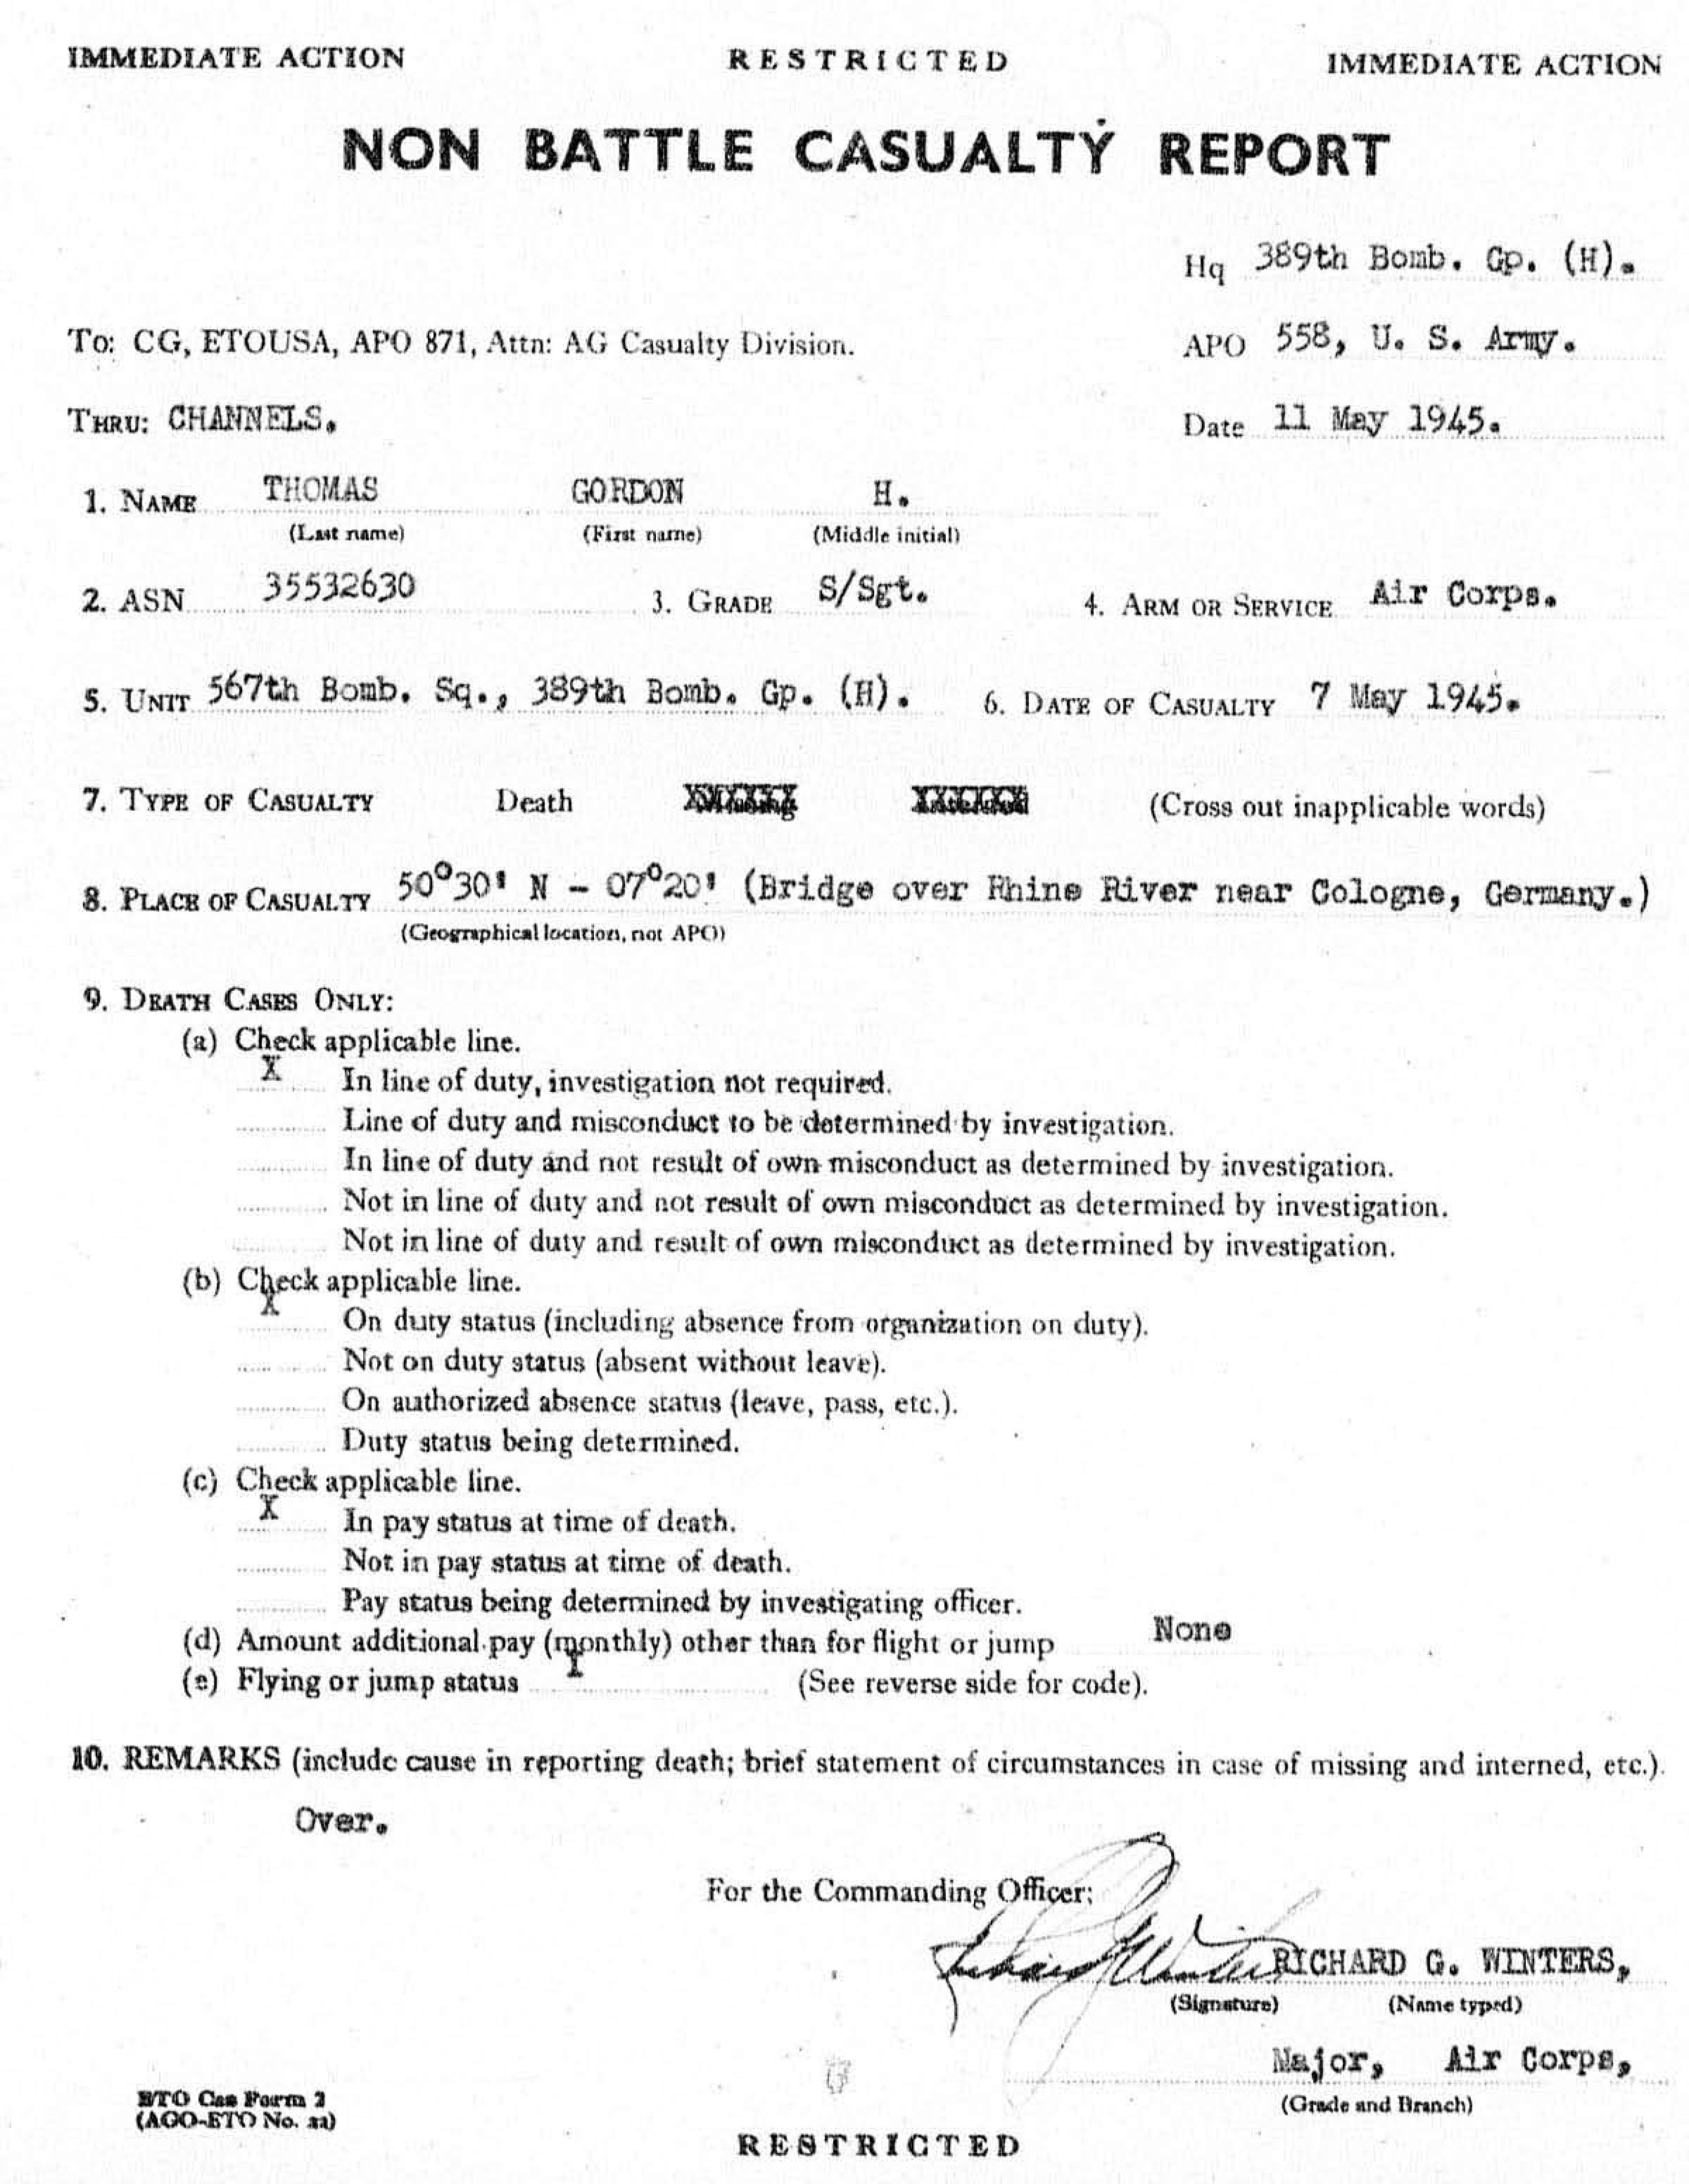 Gordon Thomas - Non Battle Casualty Report - May 1945